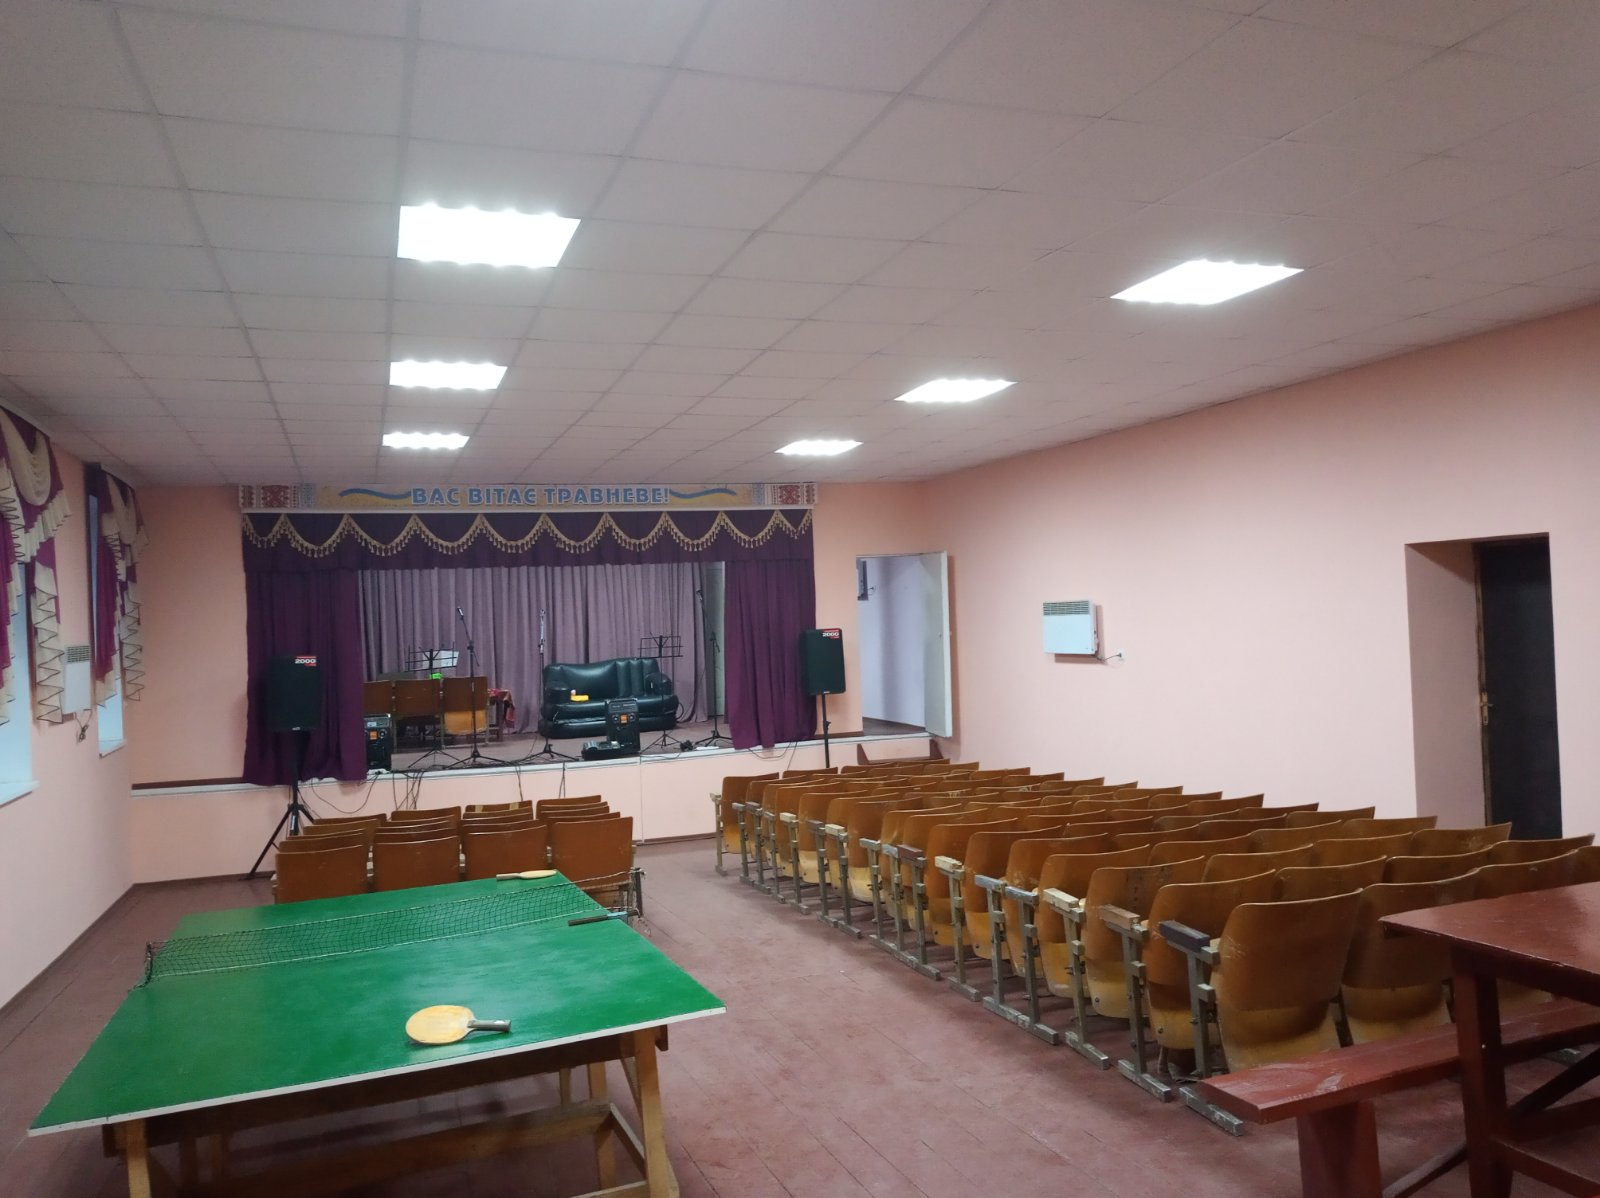 Будинок культури села Травневе Попельнастівської сільської ради